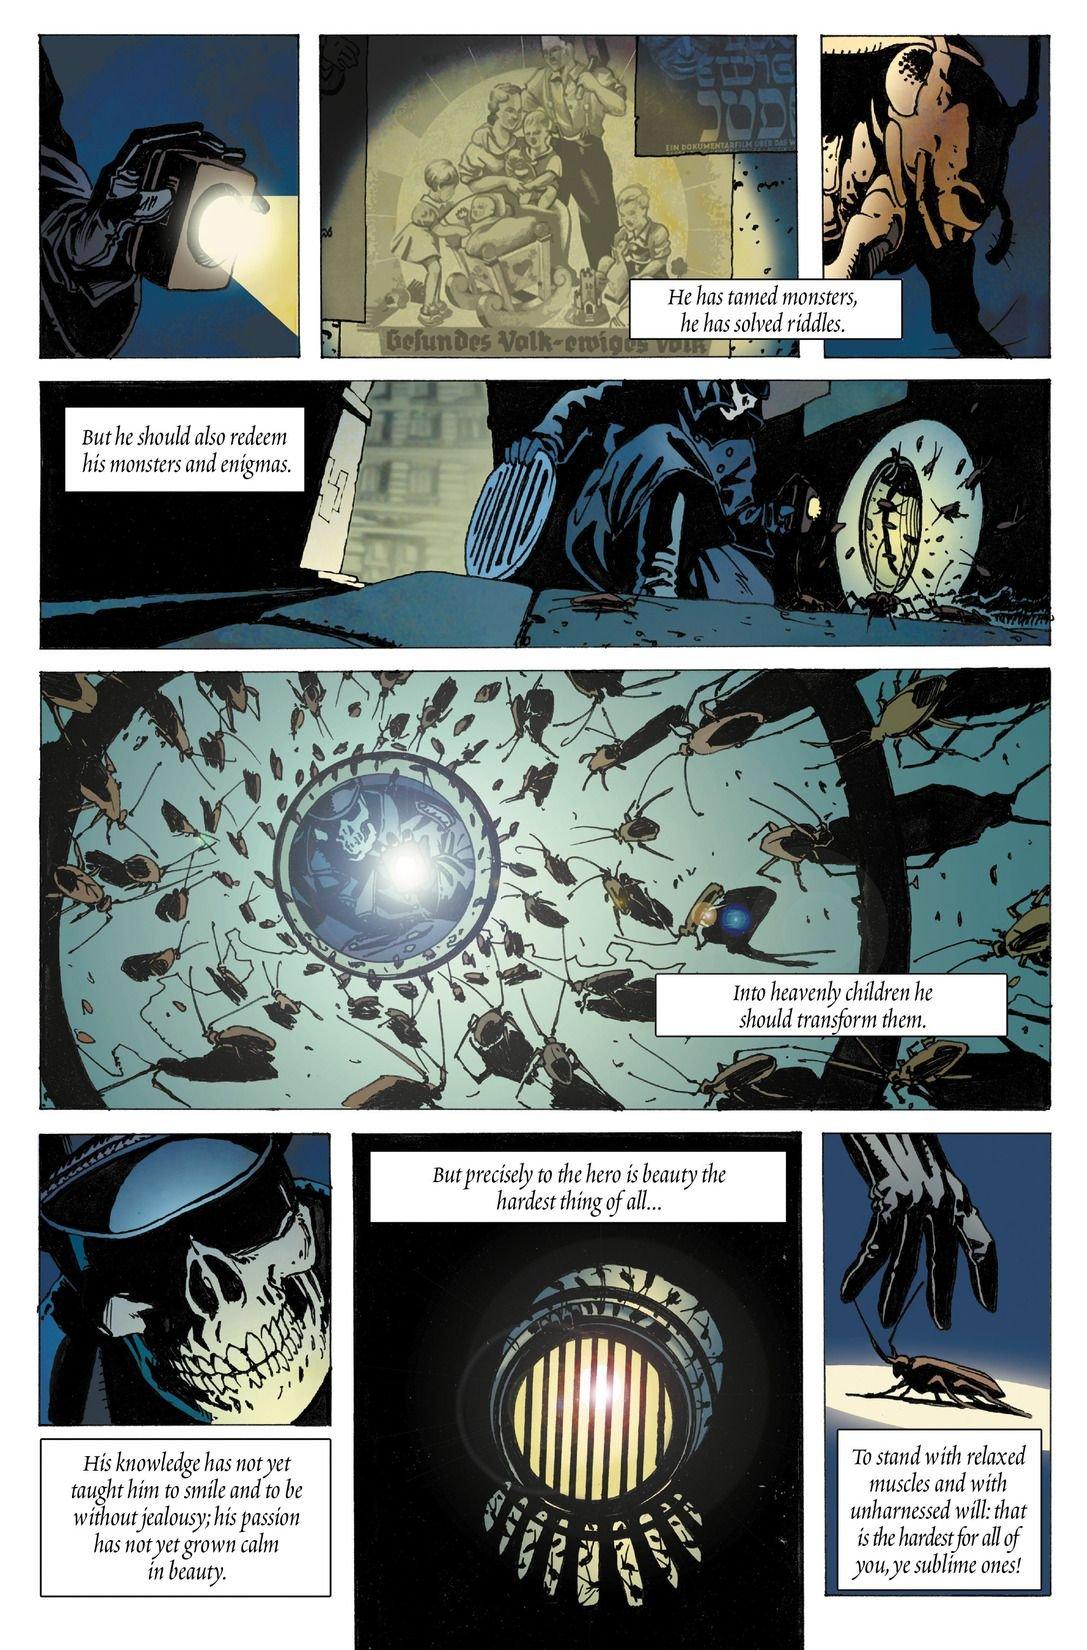 The Chimera Brigade #1 (Comic) Review 3